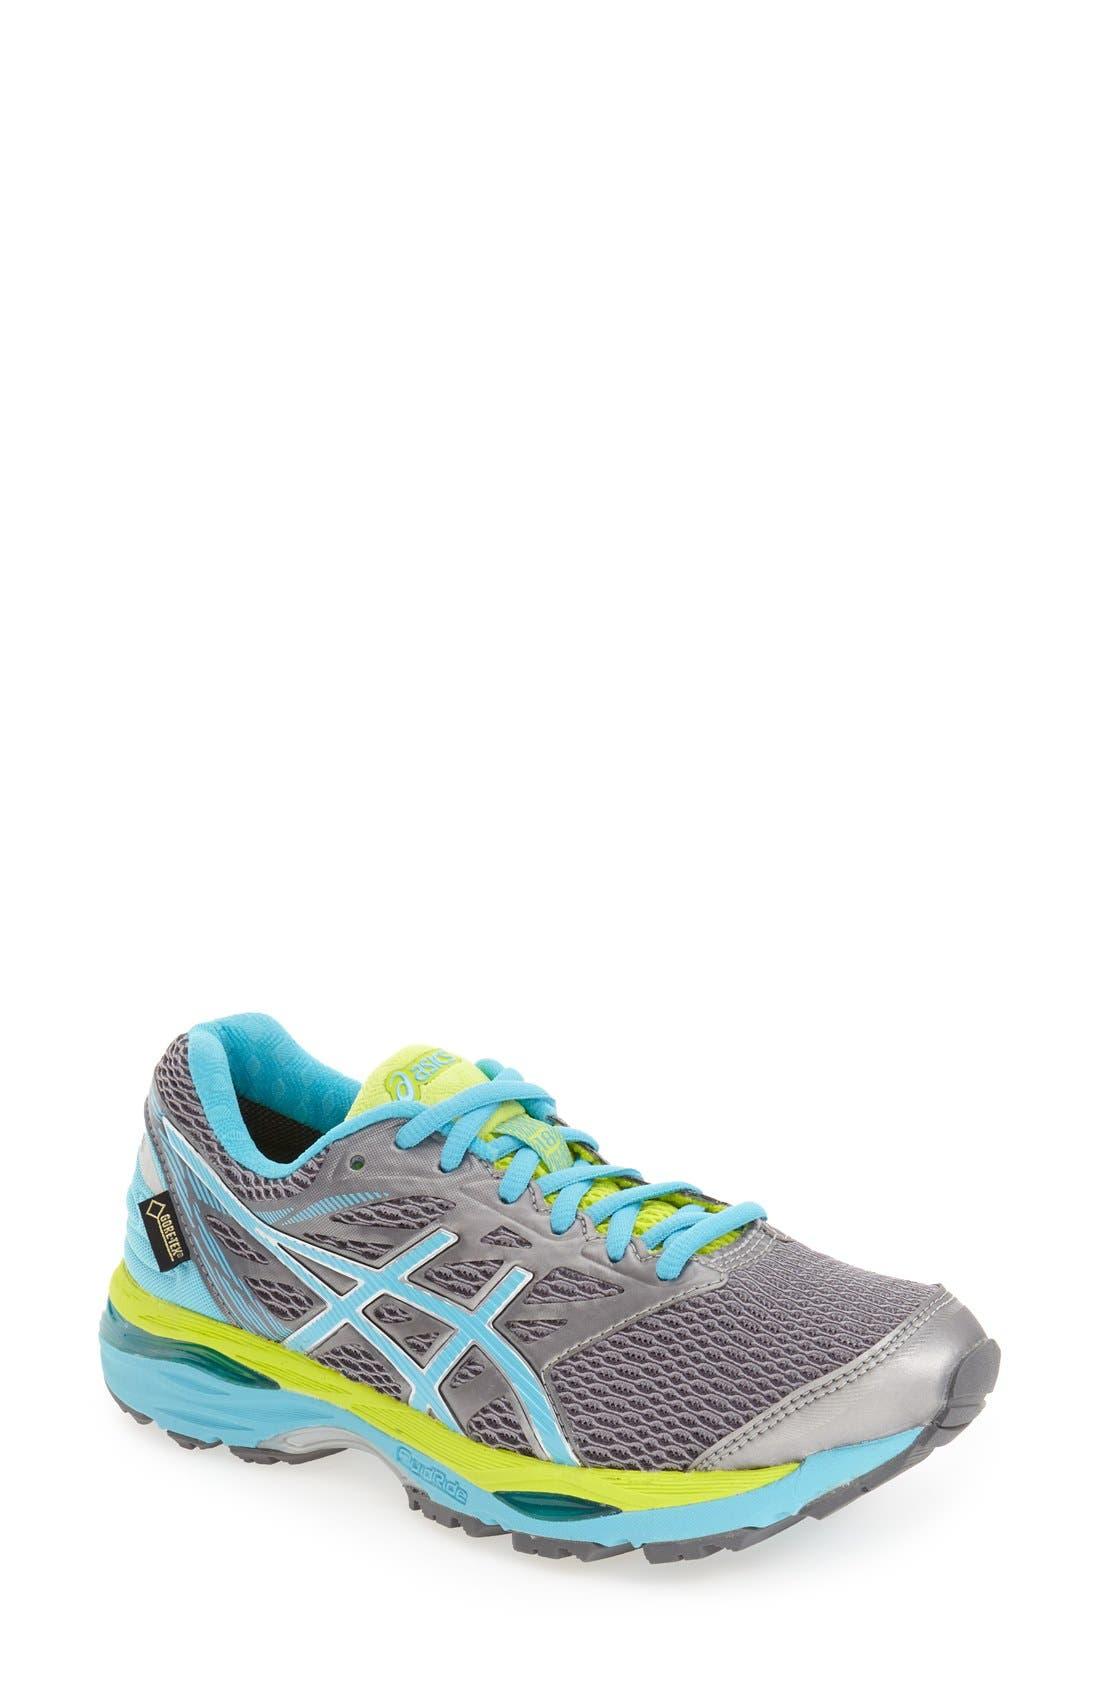 Main Image - ASICS® 'GEL-Cumulus® 18' Gore-Tex® Running Shoe (Women)